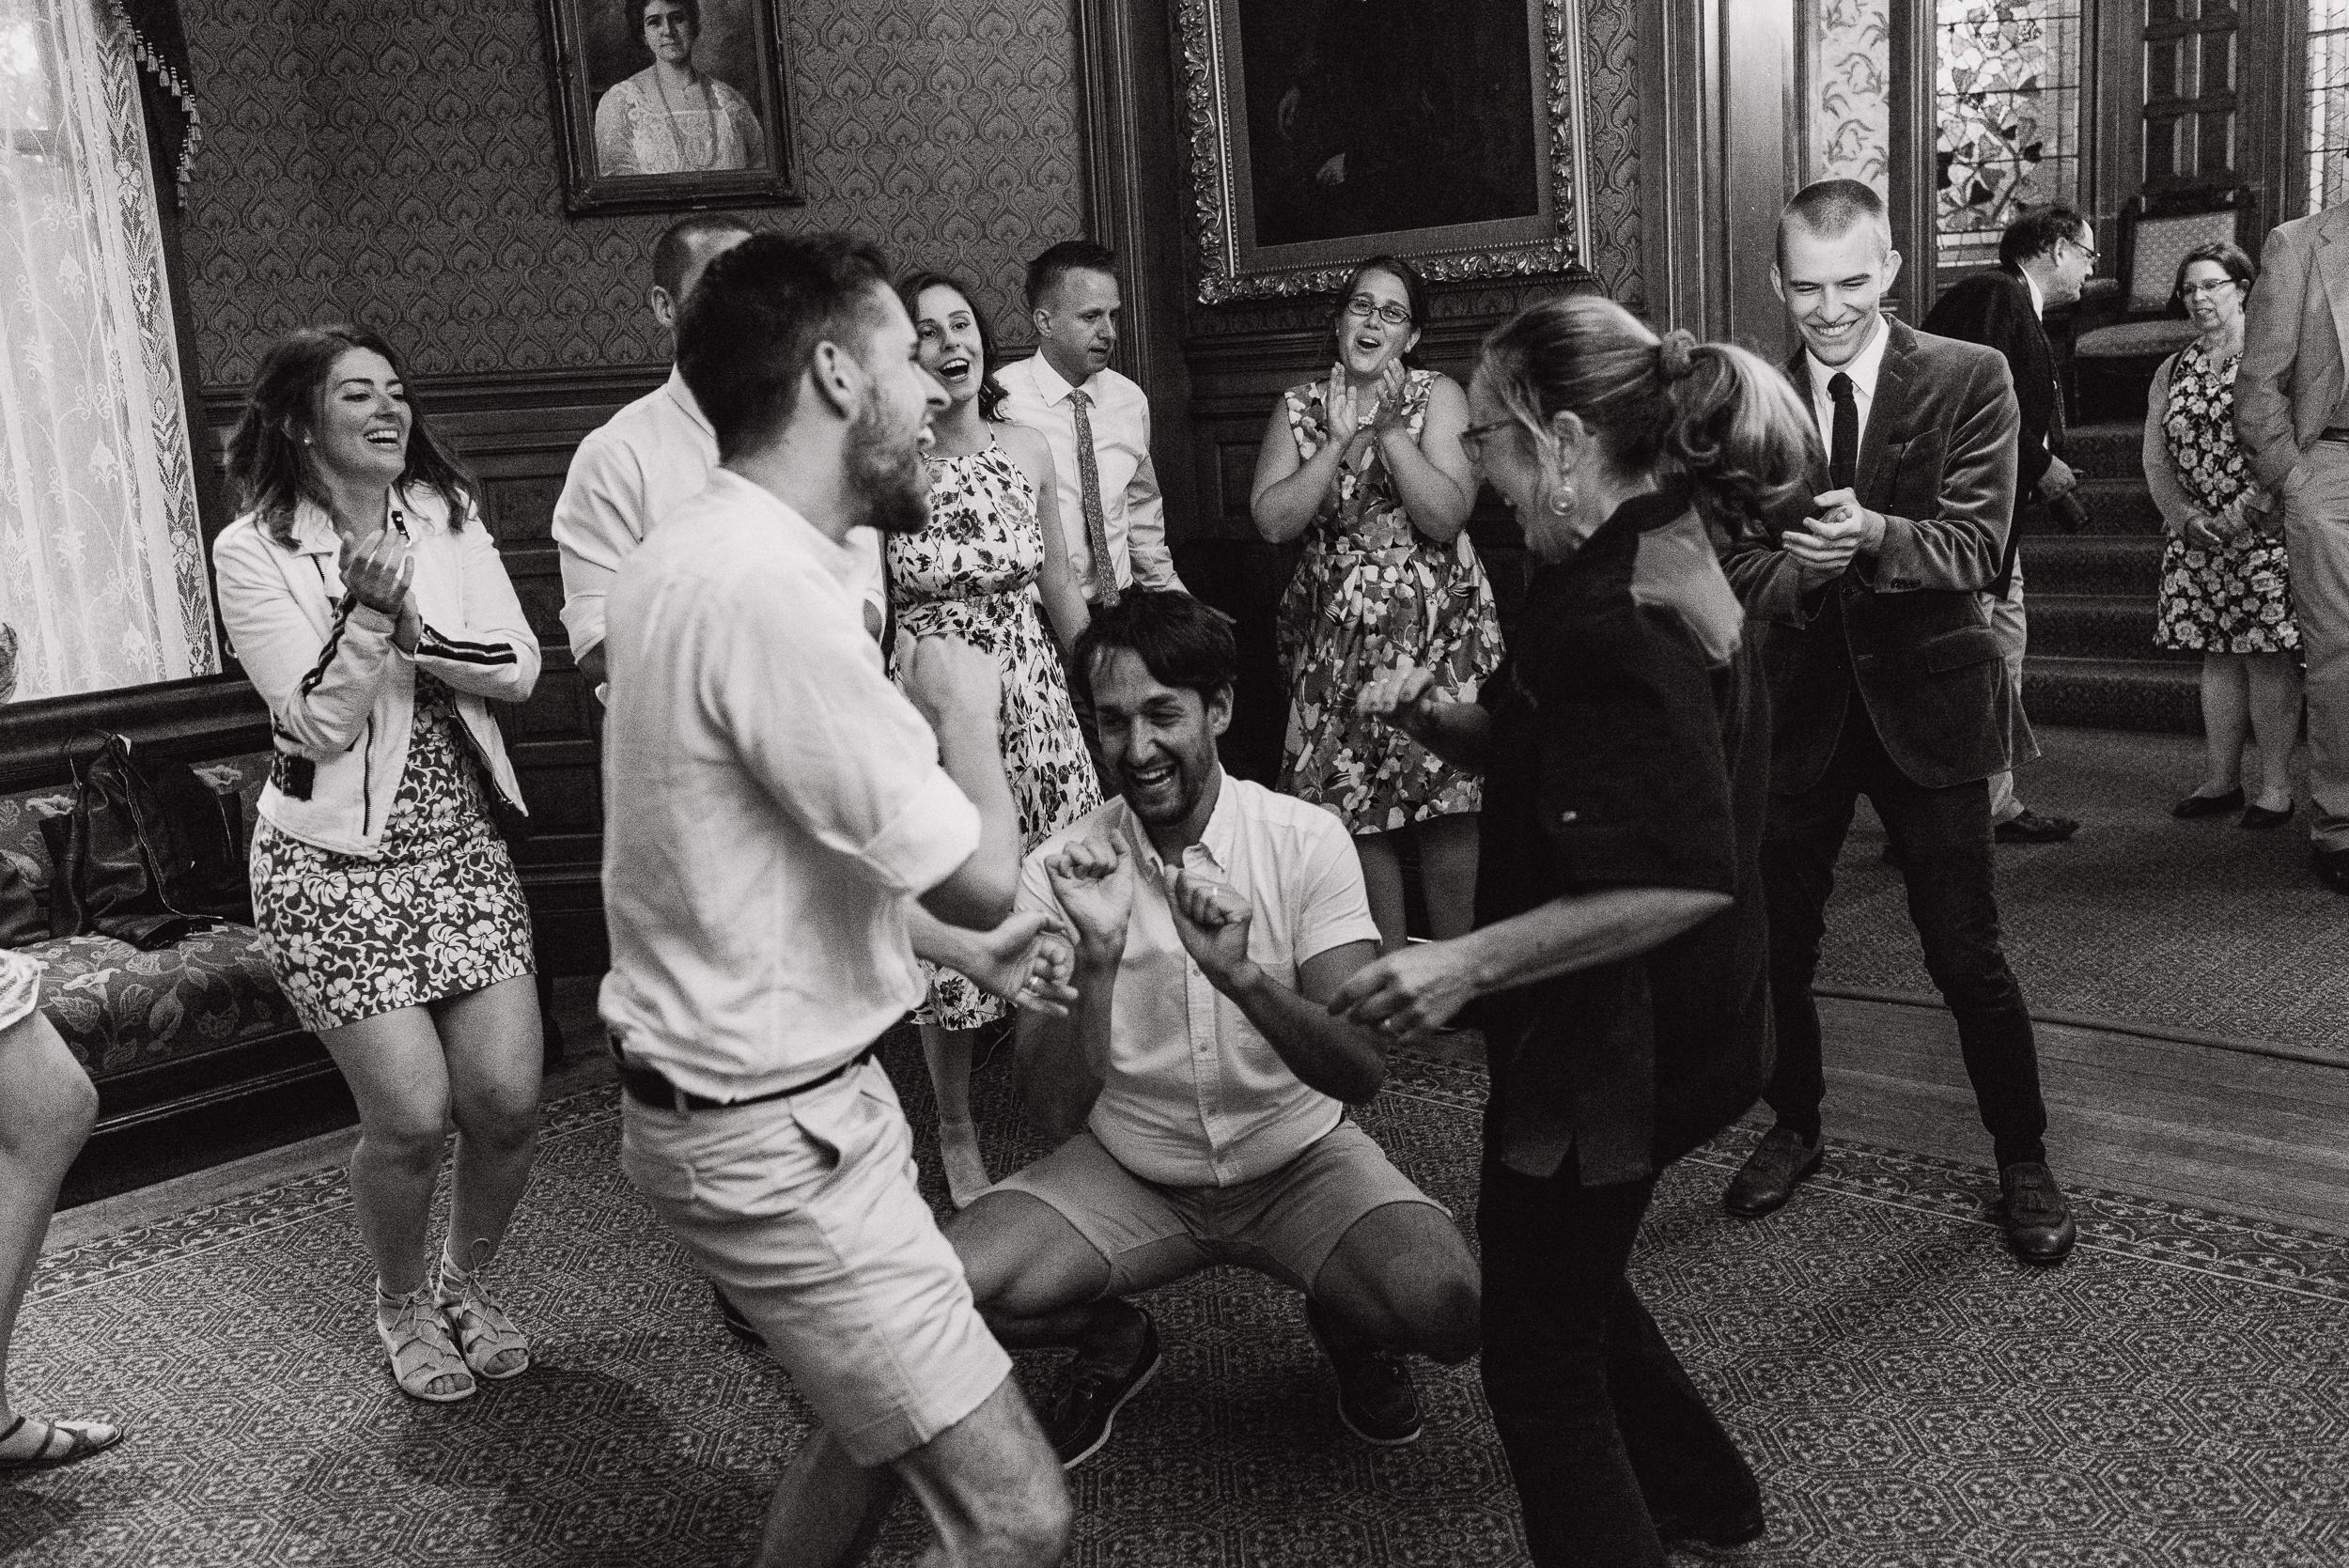 094-lgbtq-falkirk-cultural-center-wedding-photographer-vivianchen-872.jpg